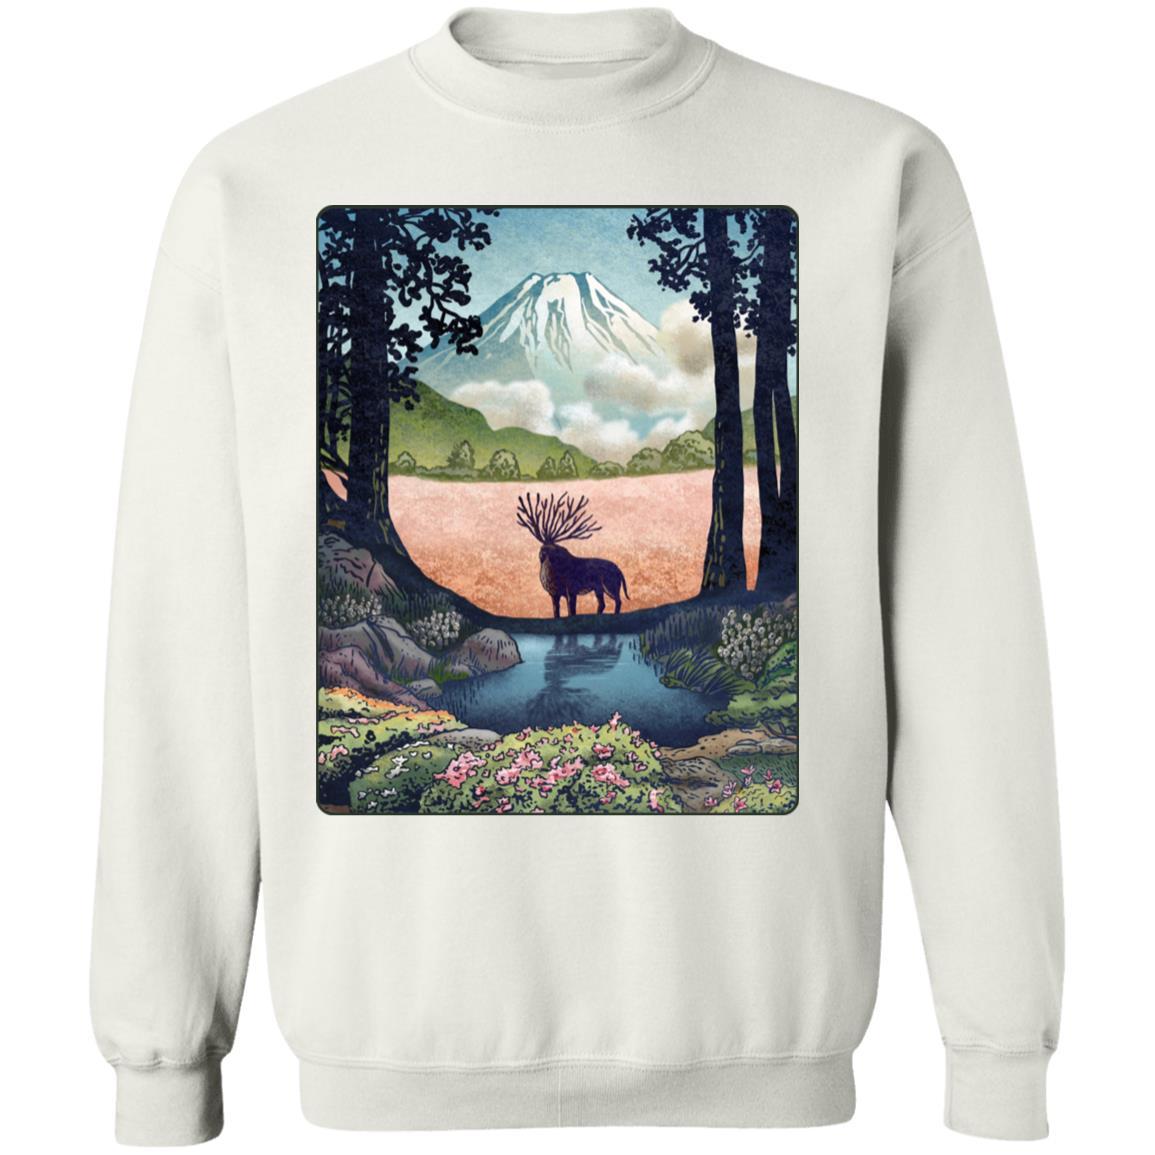 Princess Mononoke – Shishigami Day Time Landscape Sweatshirt